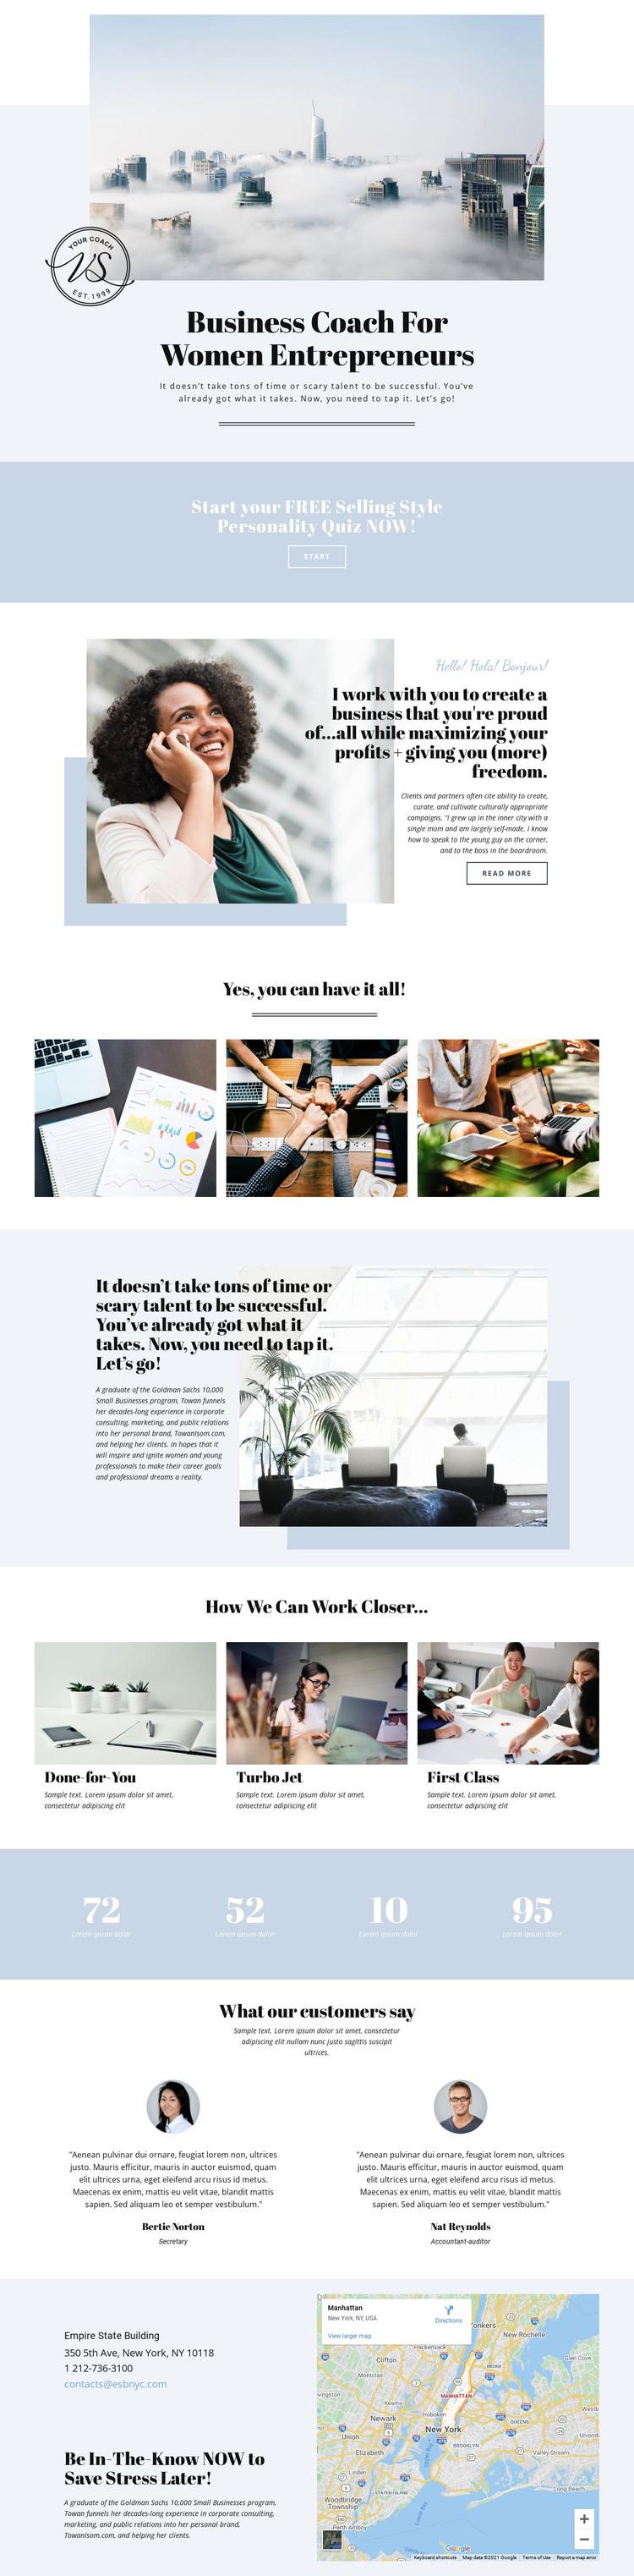 Business women entrepreneurs Web Design